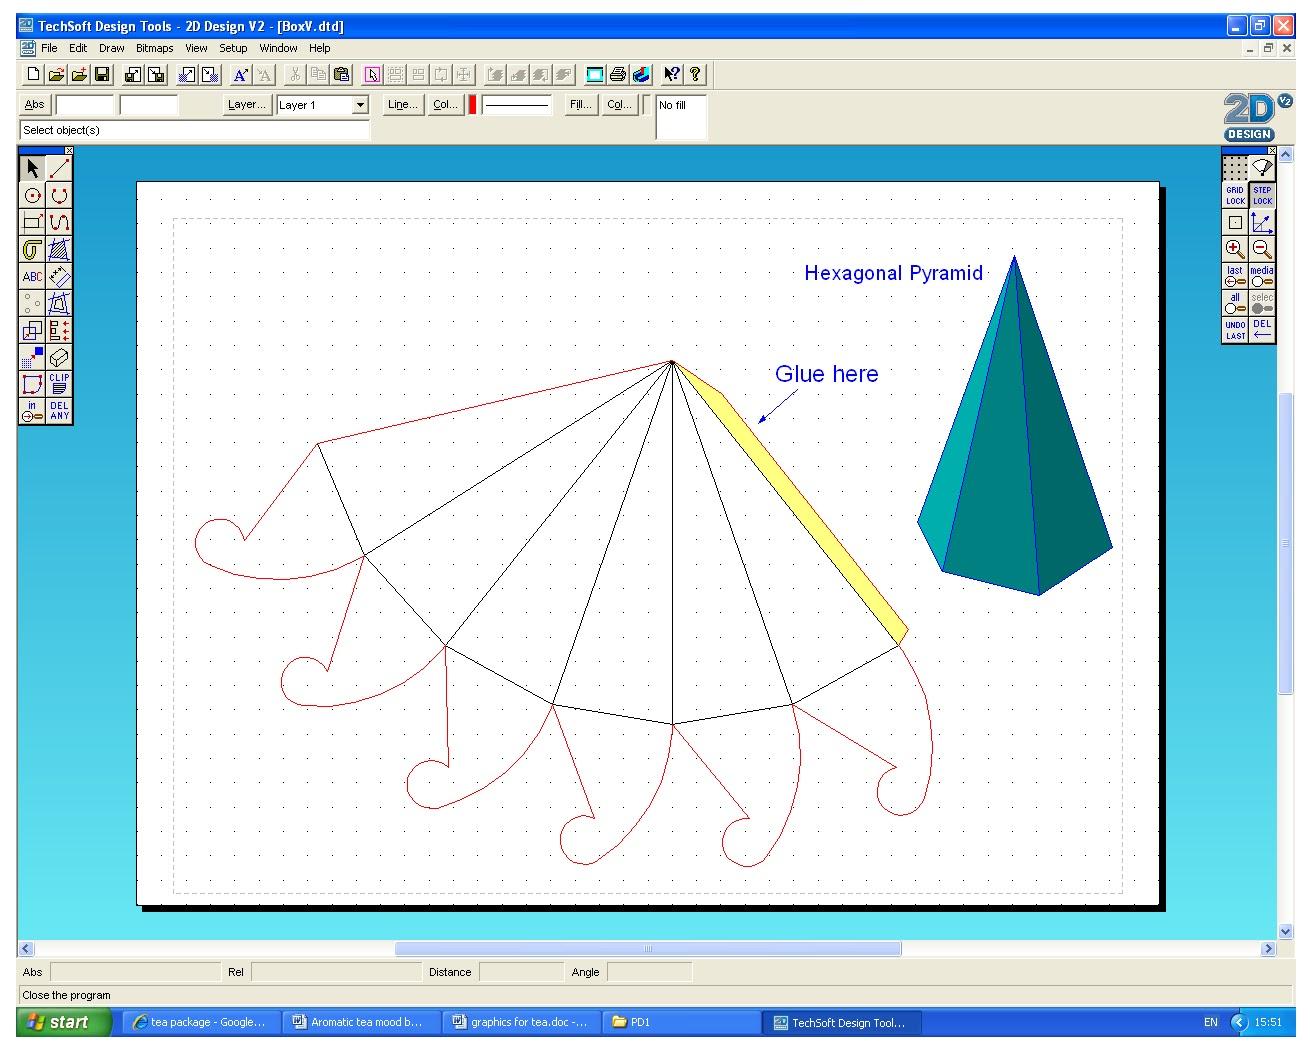 Nilesh Product Design 2 Module Task 2 Cad 2d Design